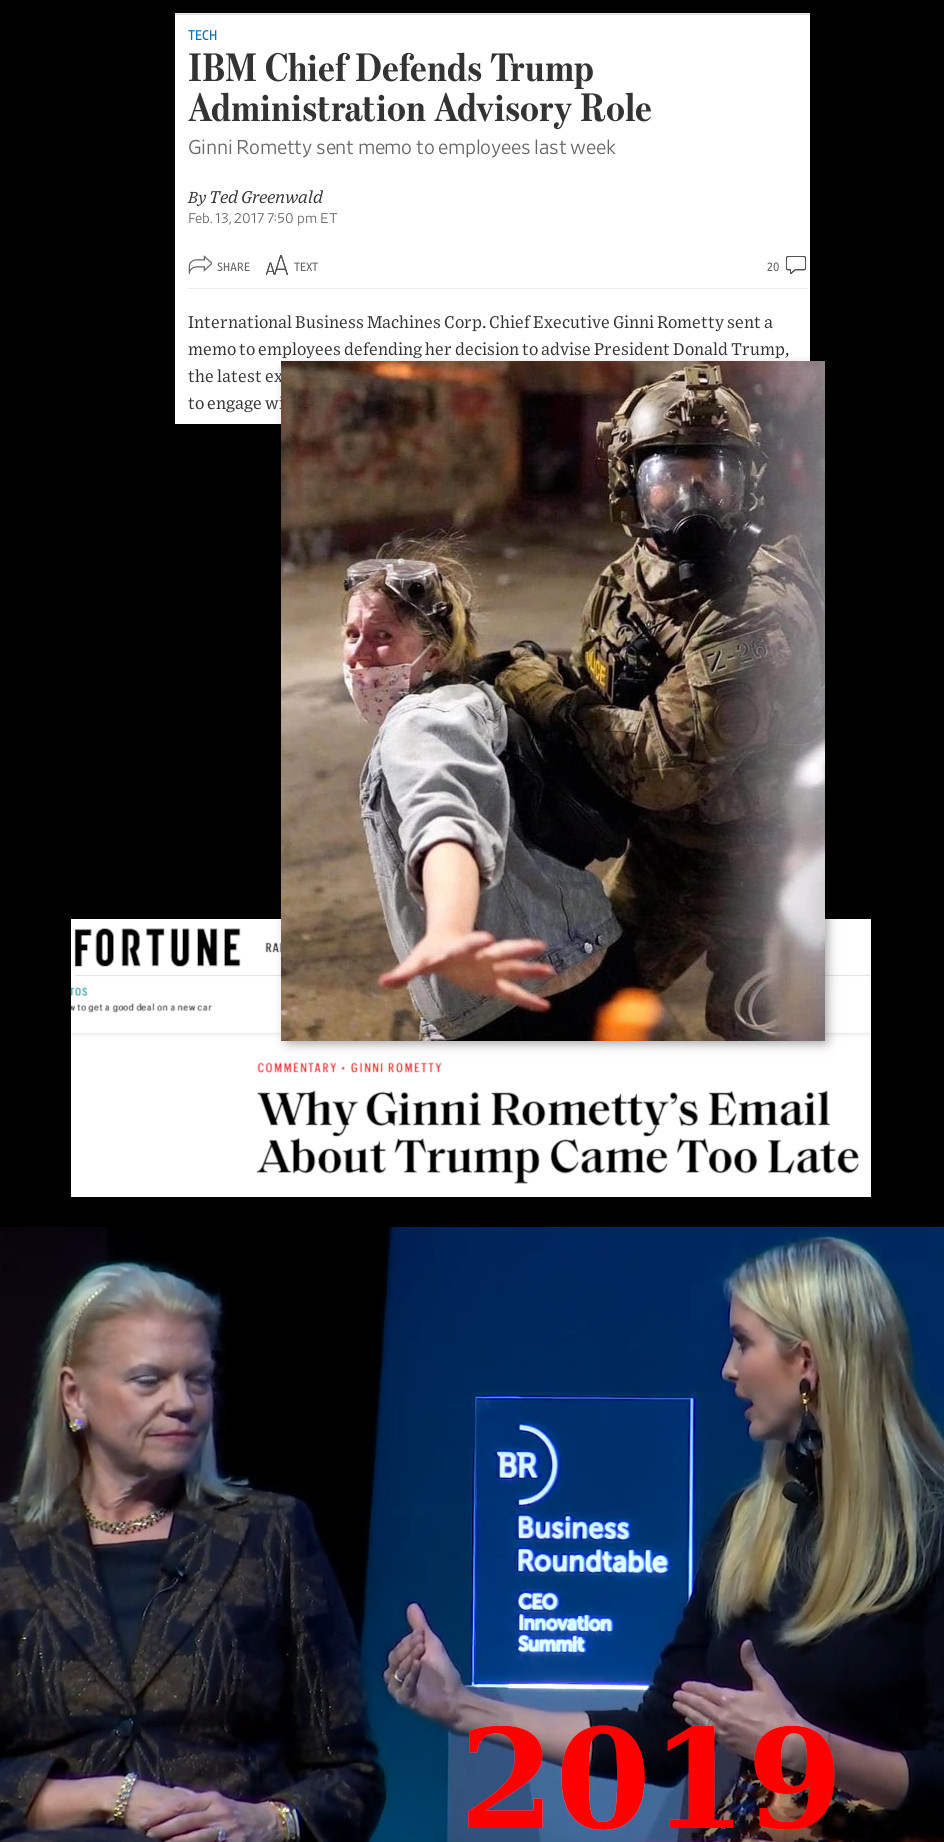 IBM and Ivanka Trump